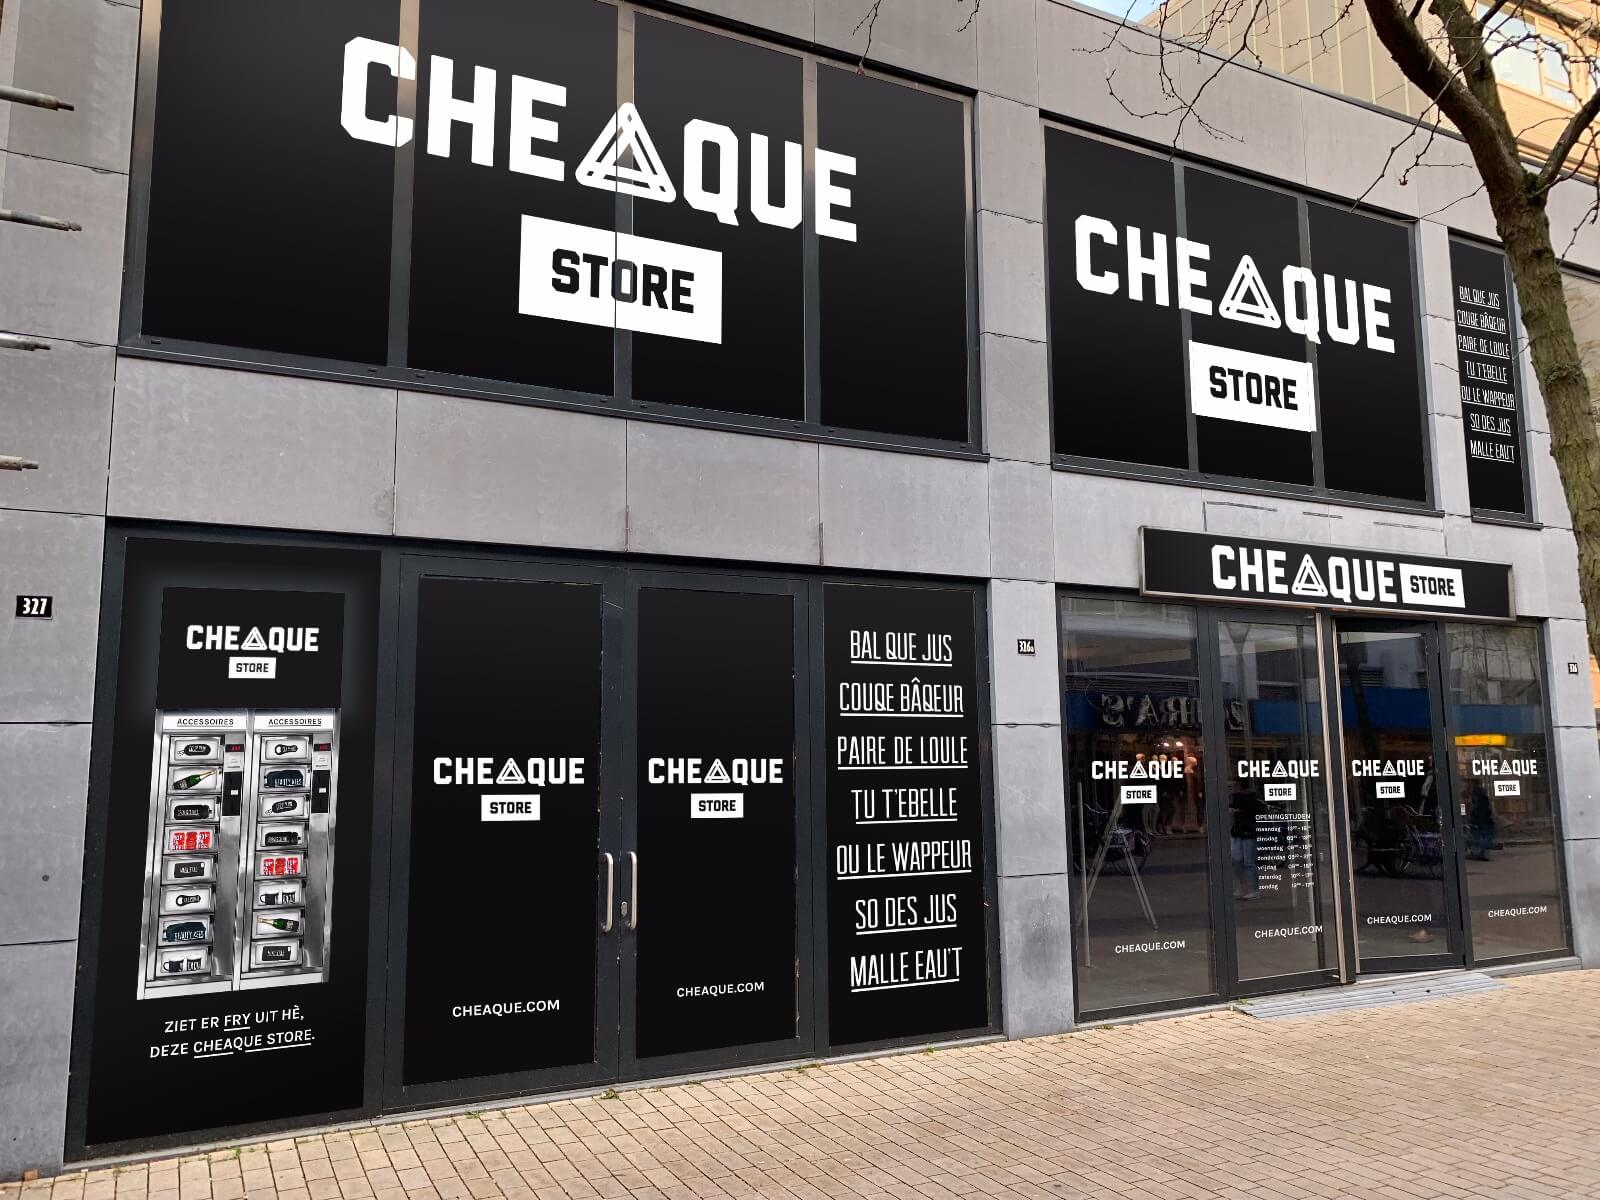 Cheaque Store Tilburg - Cheaque Store - Tilburg